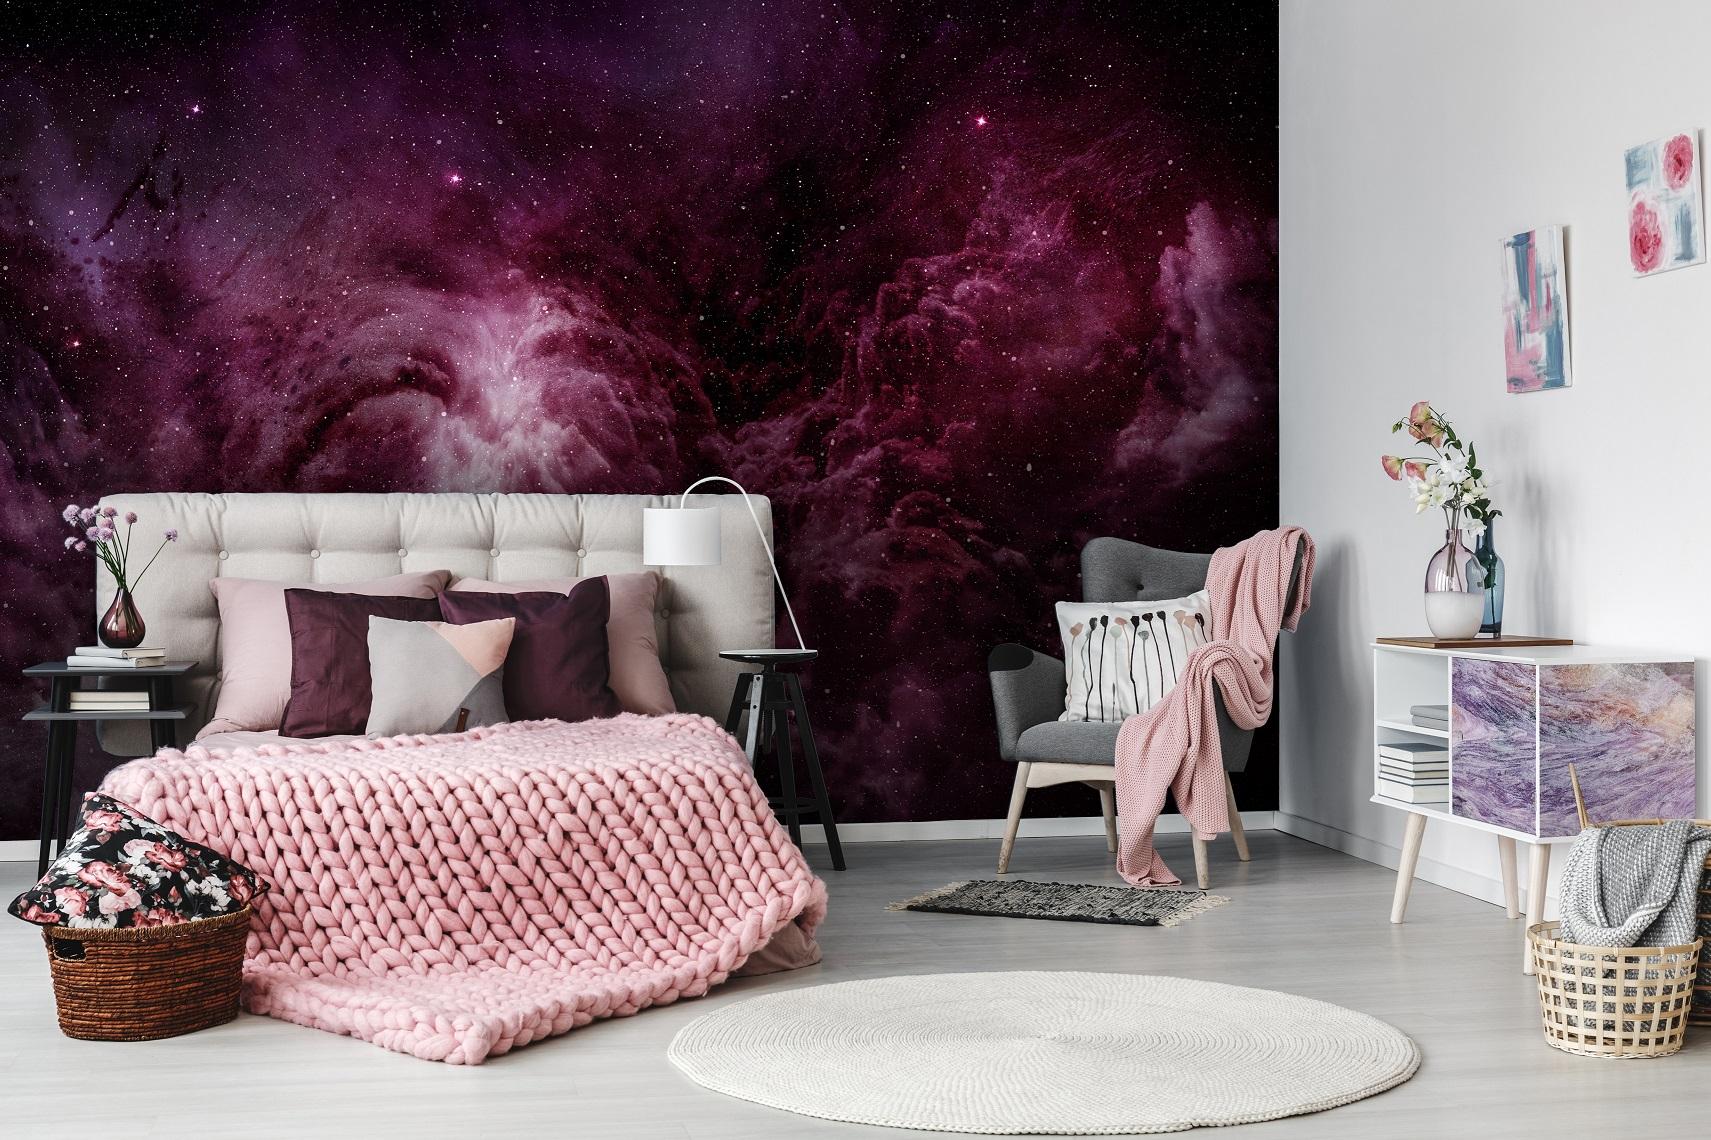 Fioletowy kolor we wnętrzach